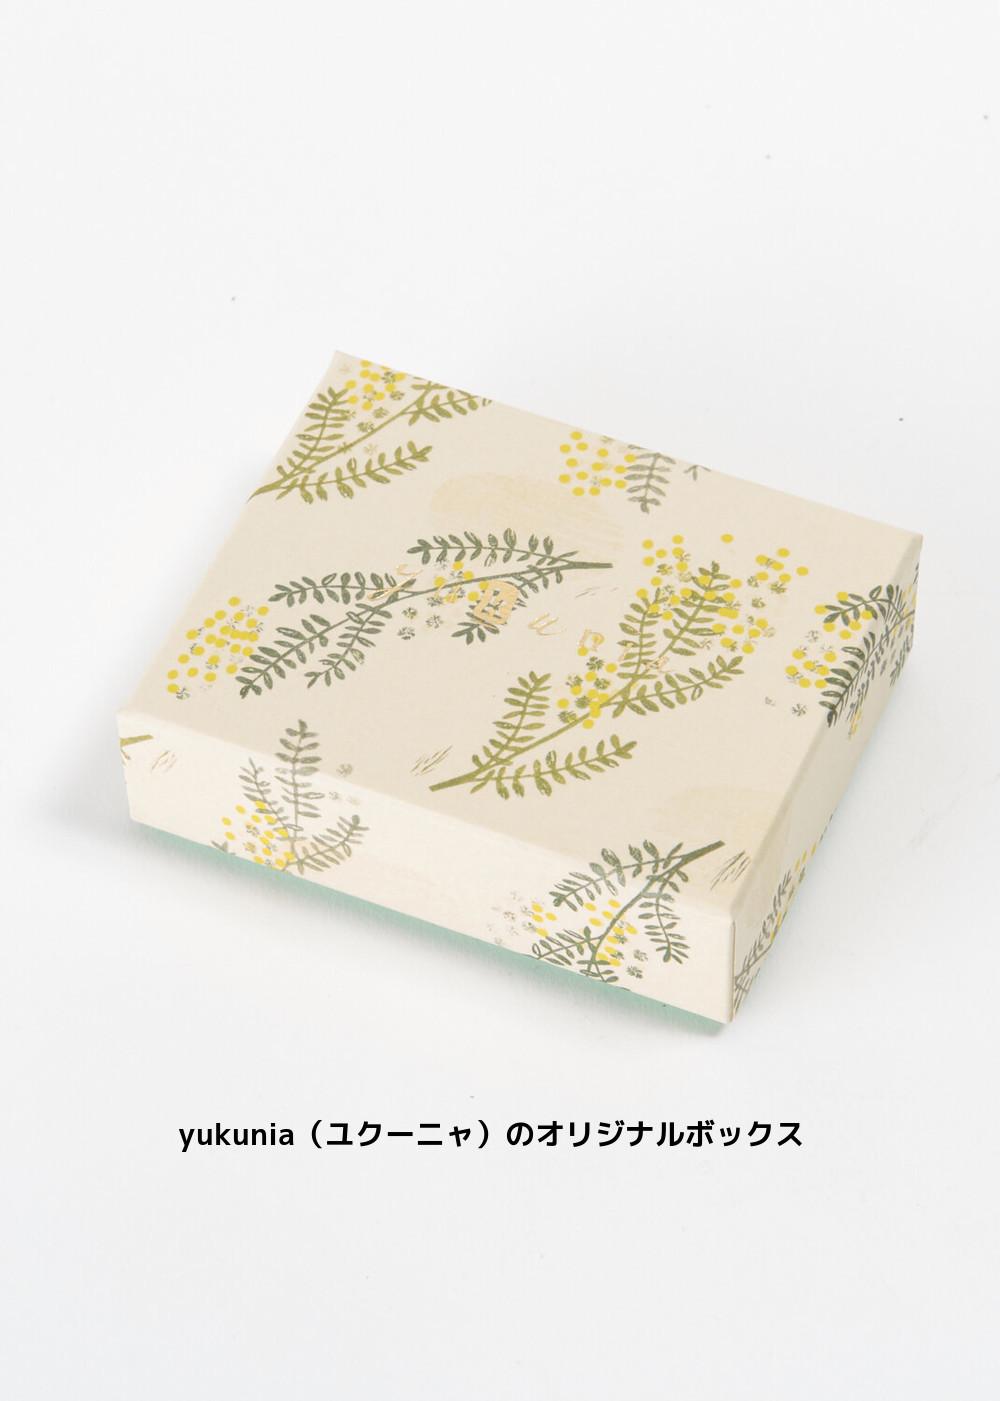 【yukunia】ユクーニャの『切手シリーズ』シルバー